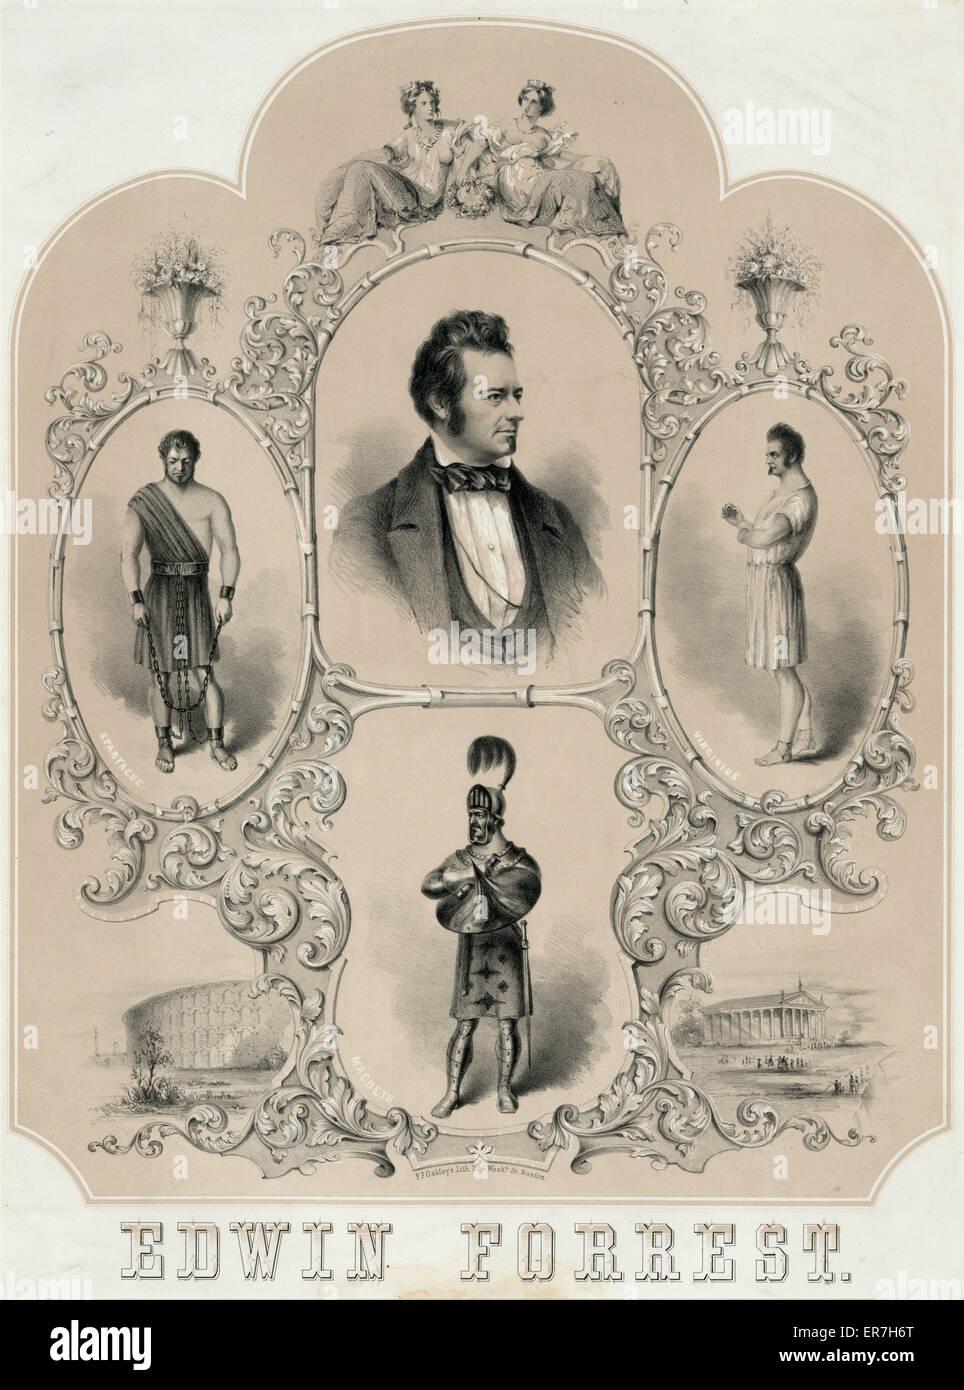 Edwin Forrest. Date c1856 Dec. 6. - Stock Image